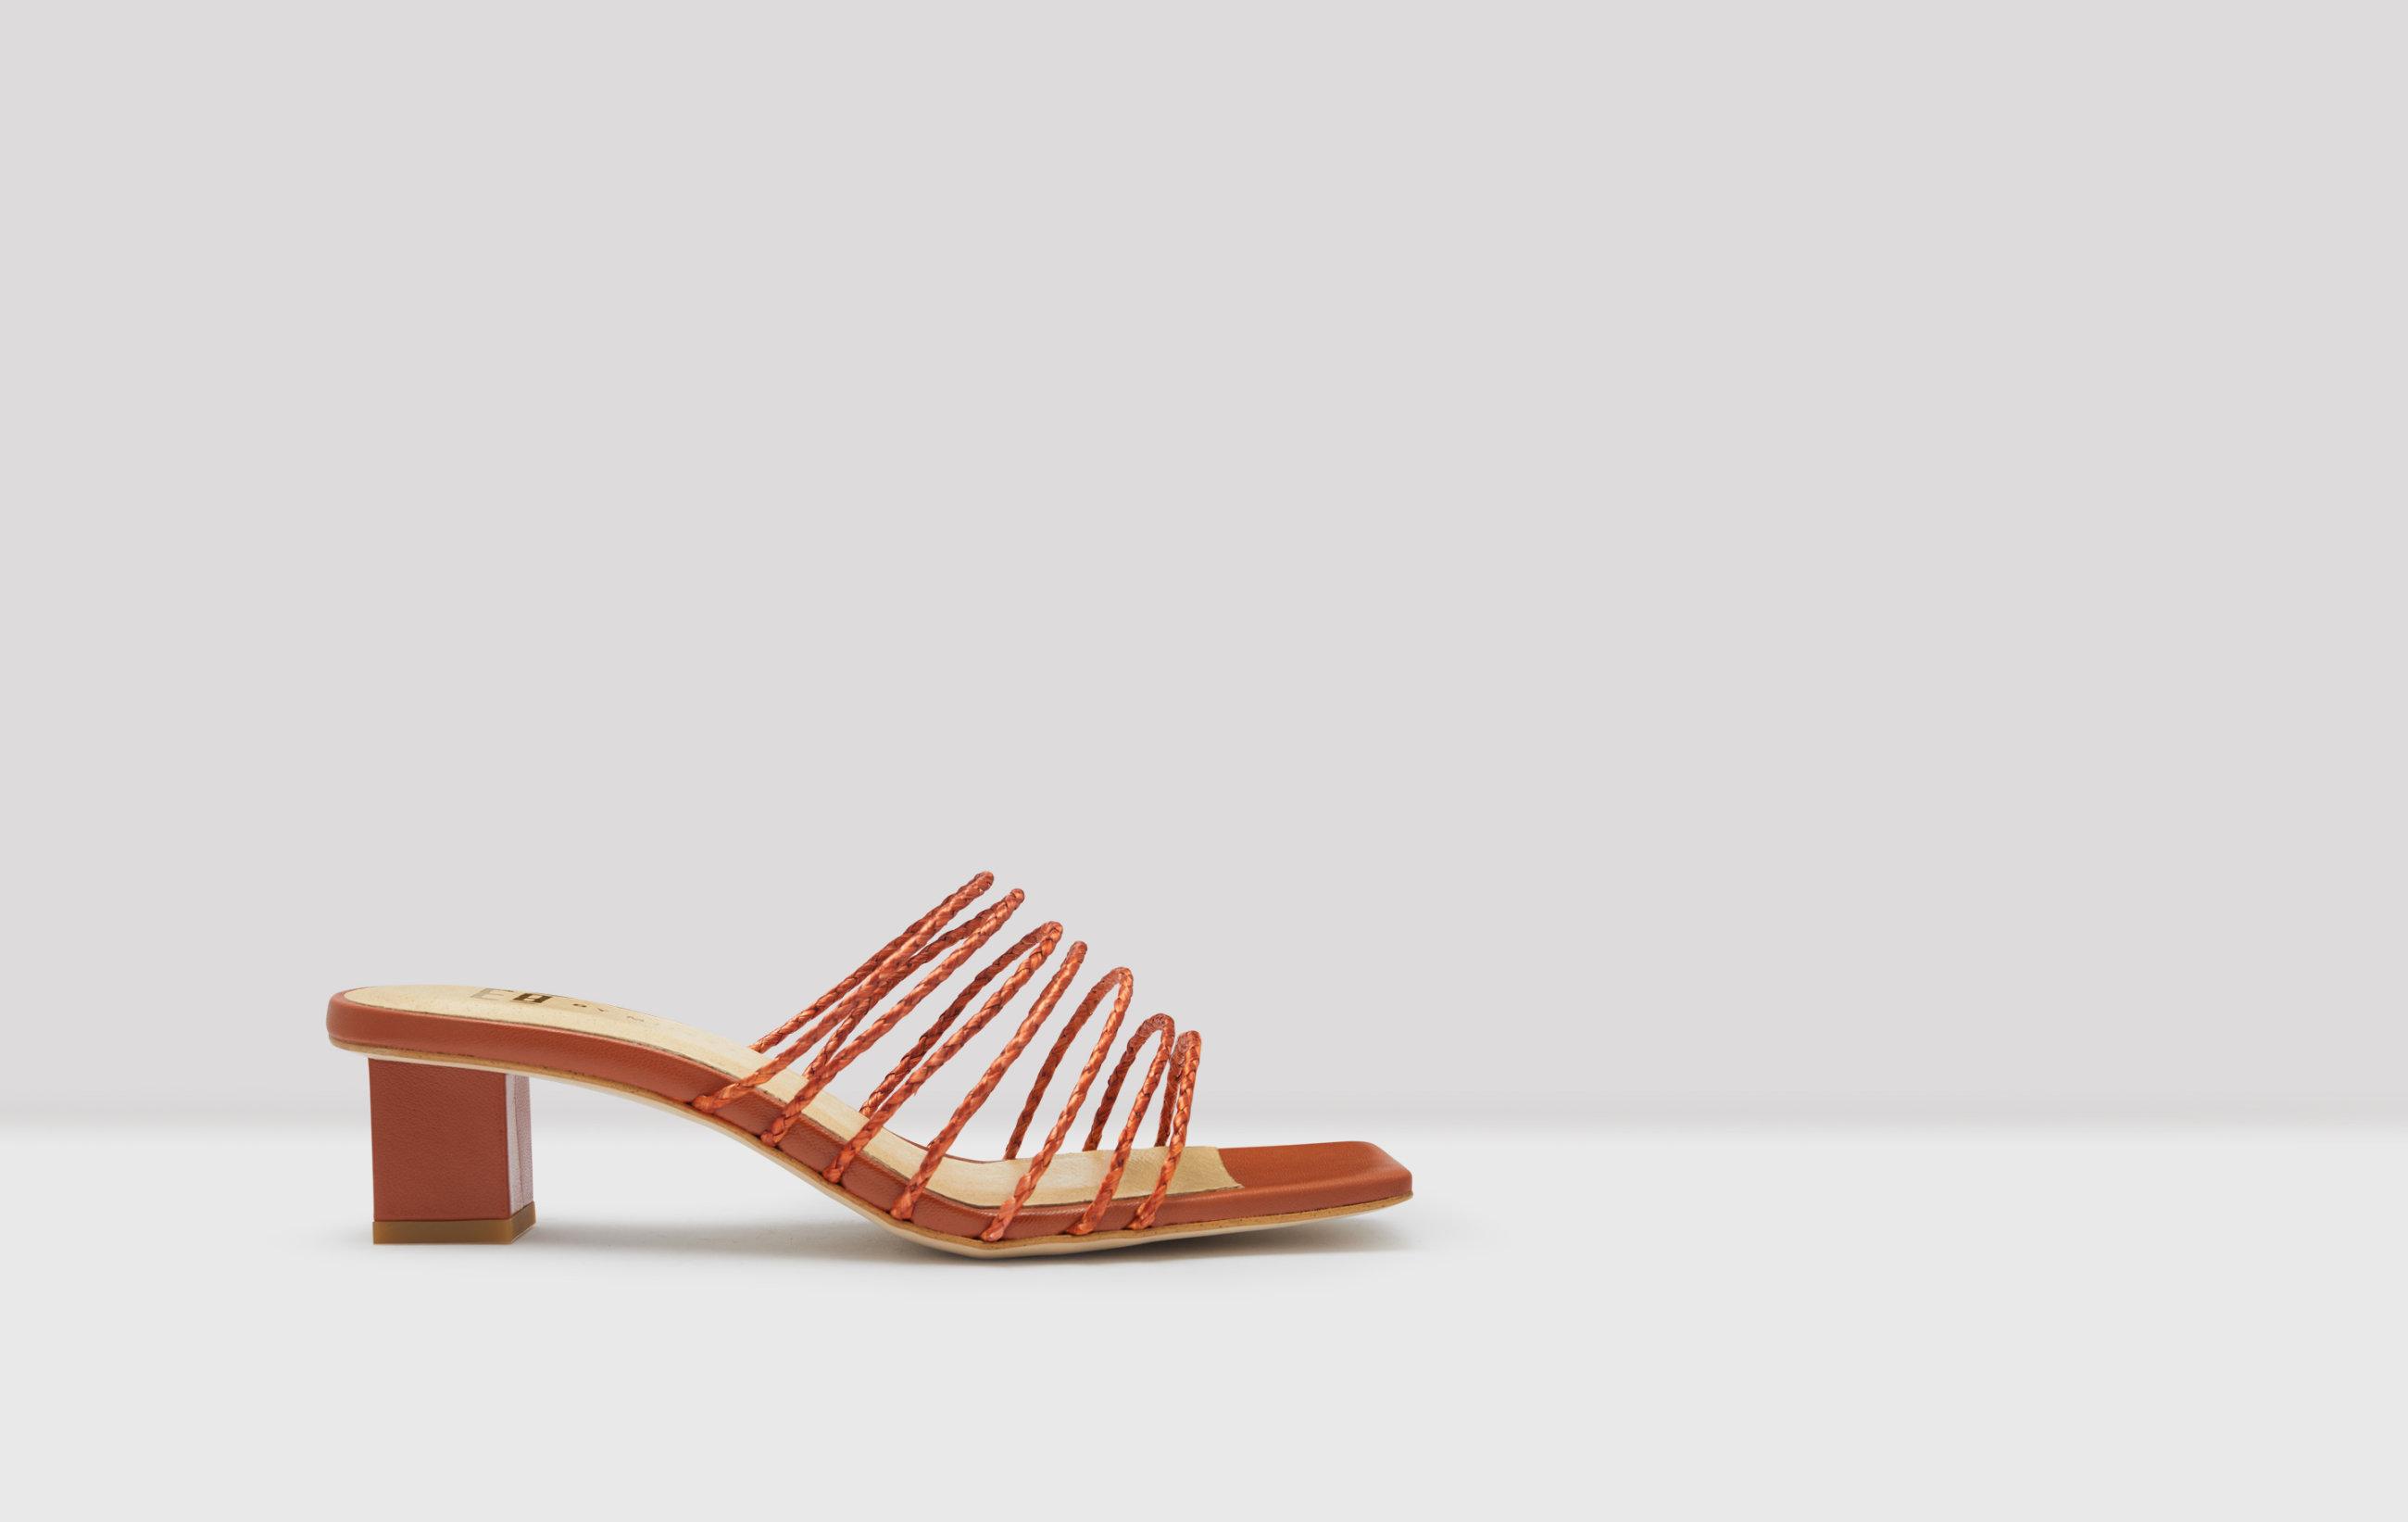 Nahla Tigerlily Raffia Sandals E8 By Miista E8 Sandals